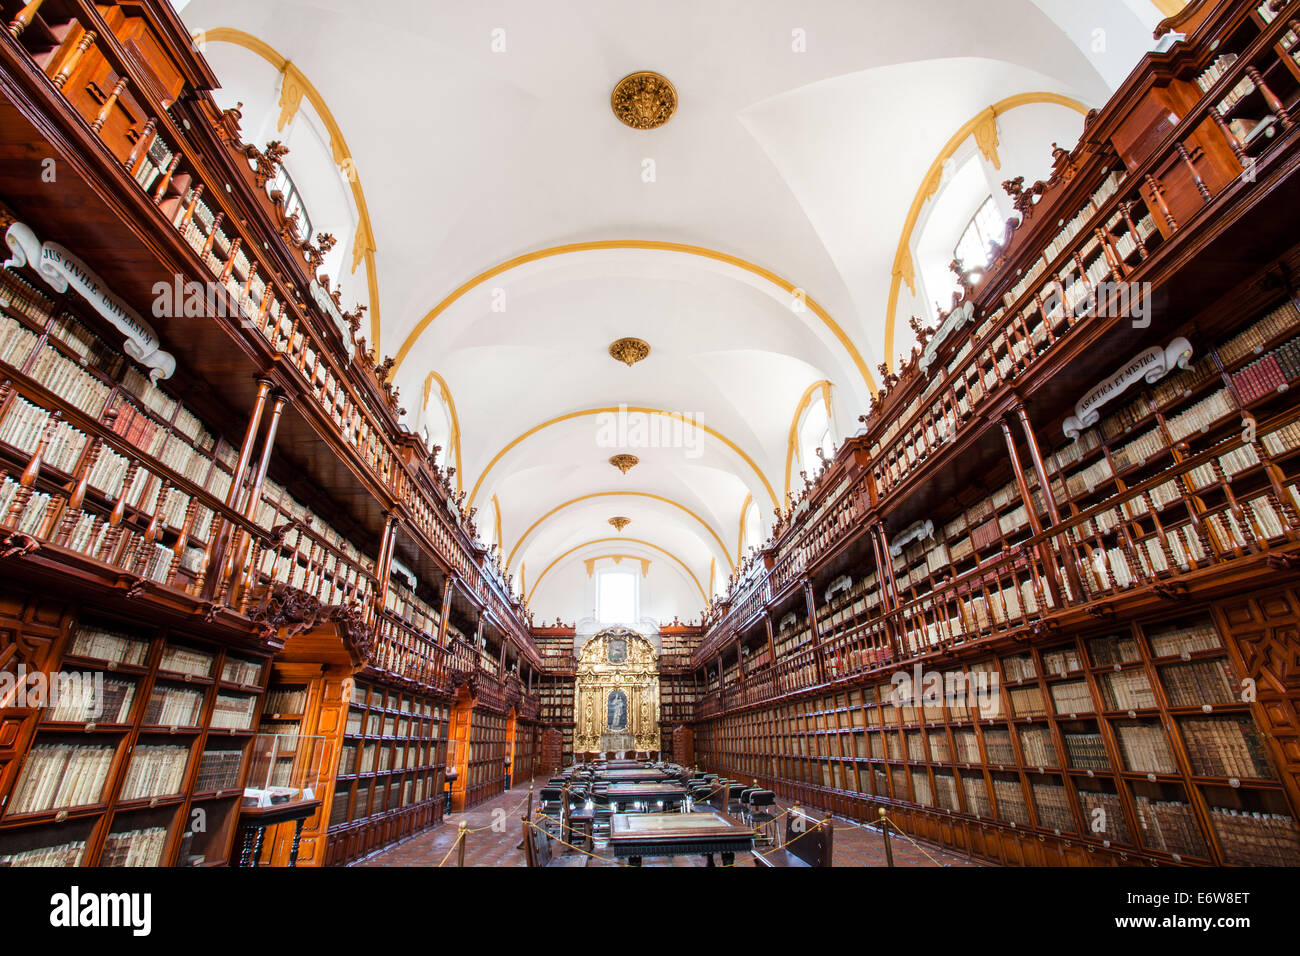 The historic Palafox Library in Puebla, Mexico. - Stock Image